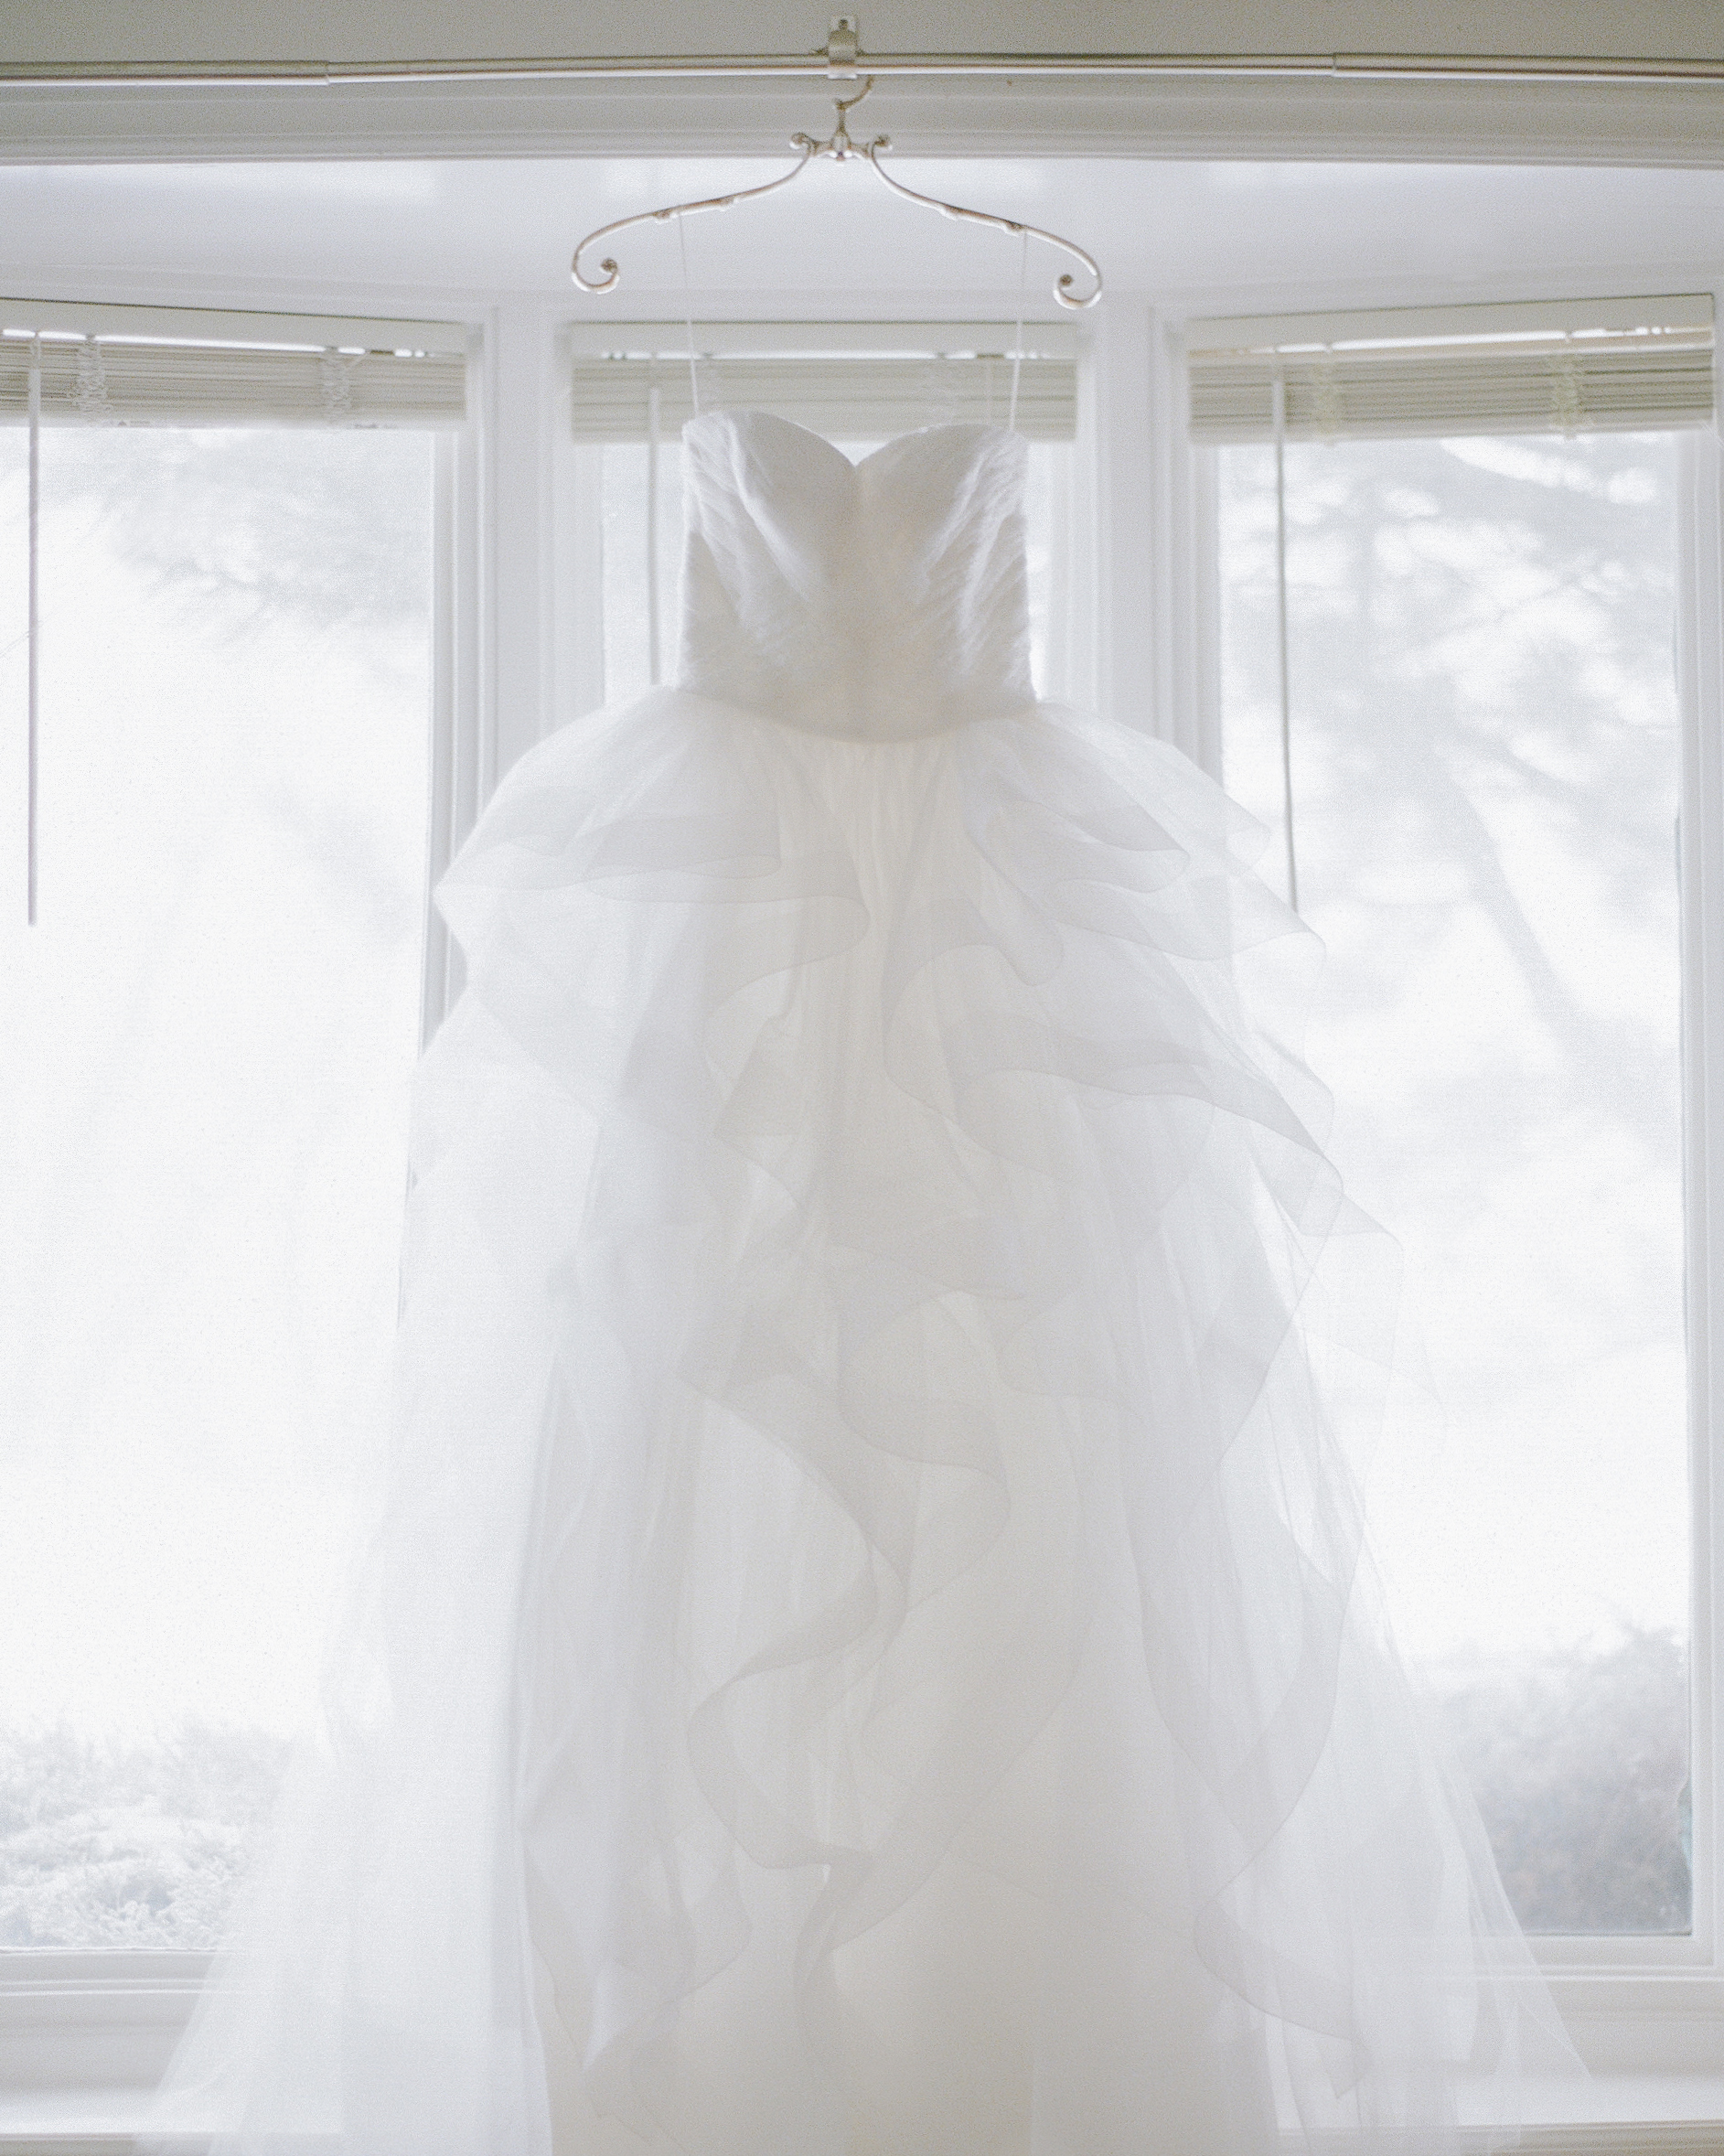 kendall-grant-wedding-dress-002-s112328-1215.jpg